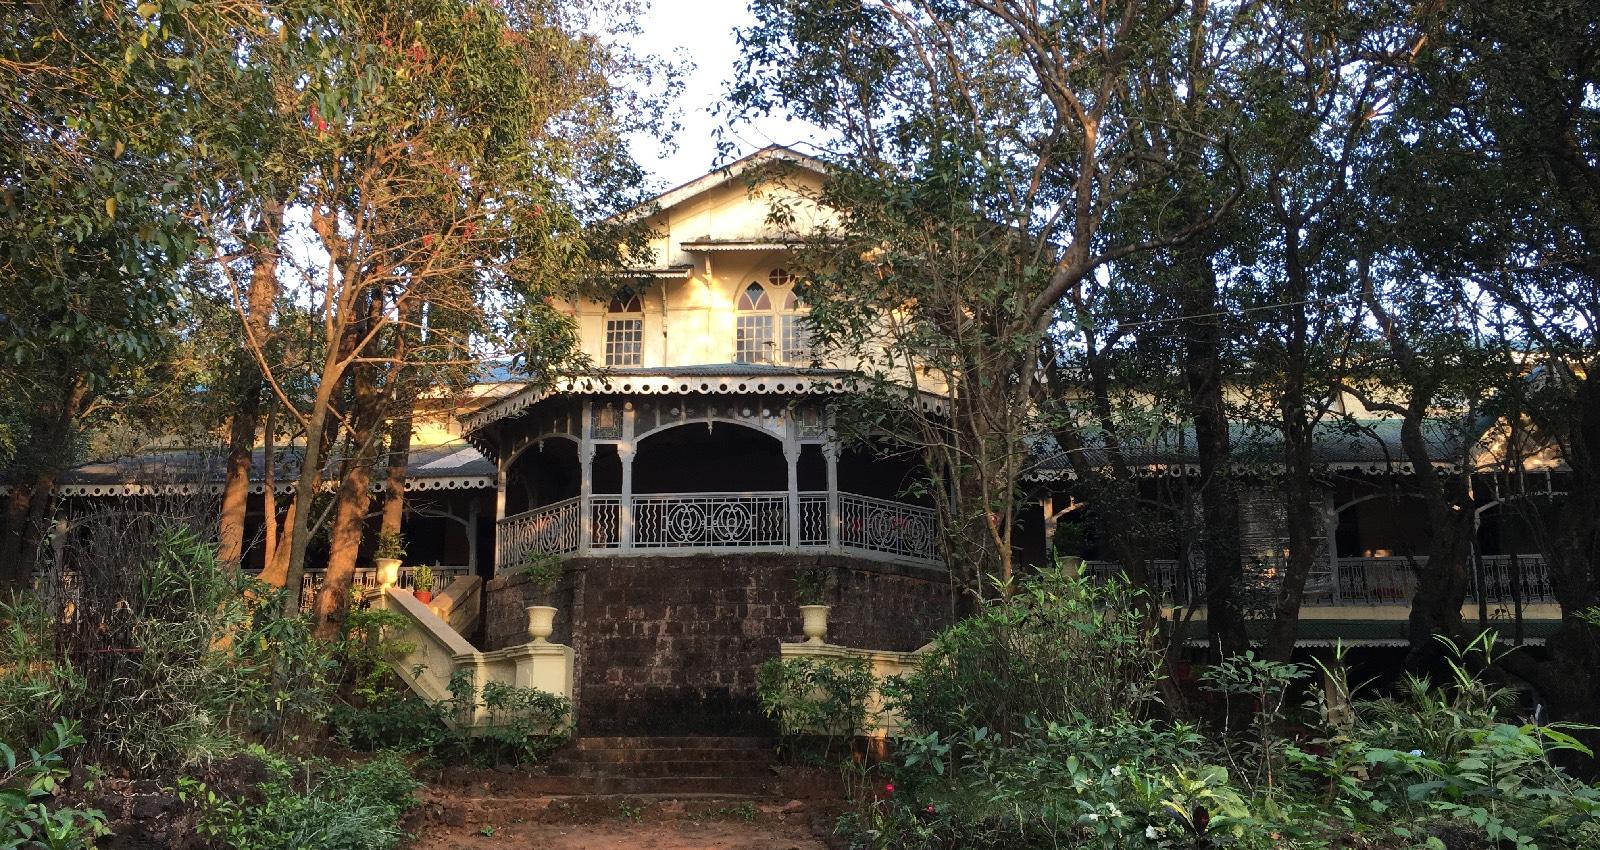 Viw of the verandah at Dune Barr House Verandah in the Forest locatad in Matheran Near Mumbai